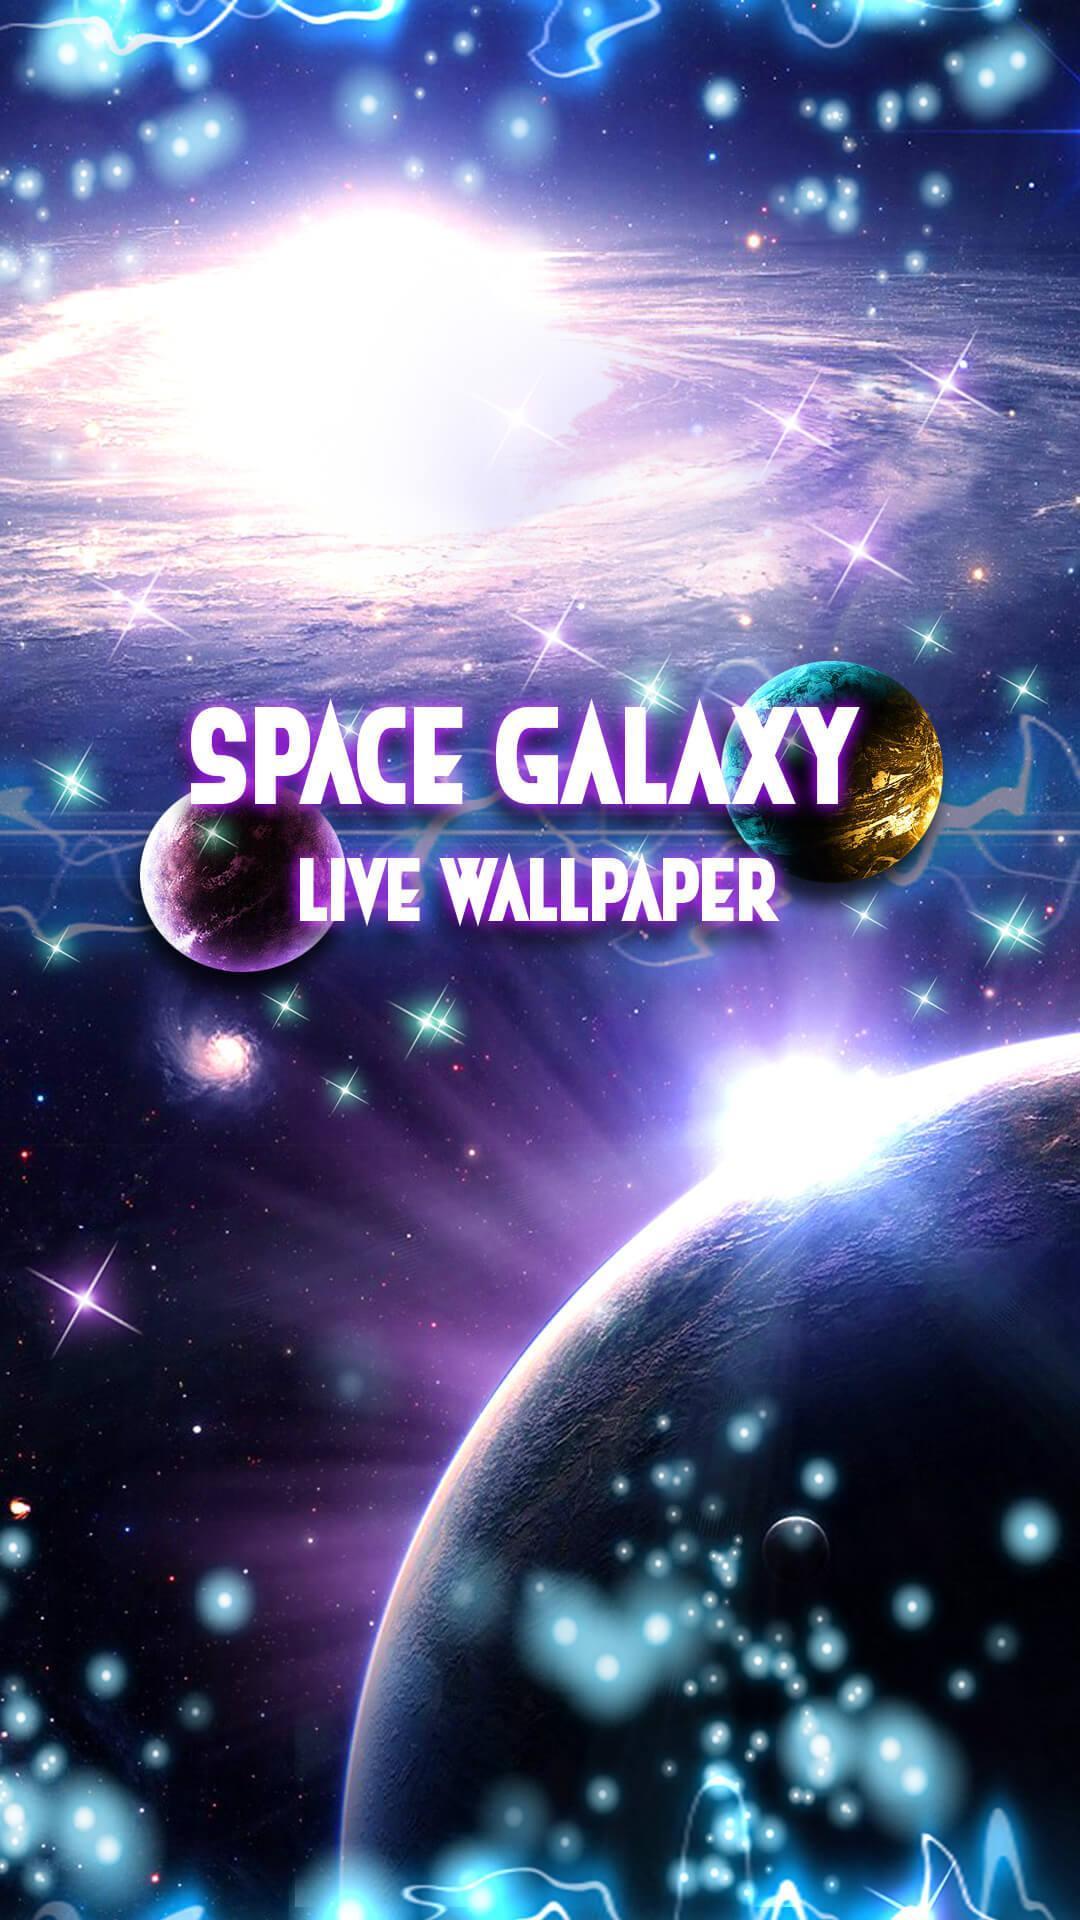 Android 用の 銀河 背景 ライブ壁紙 宇宙 動く壁紙 アニメ Apk を